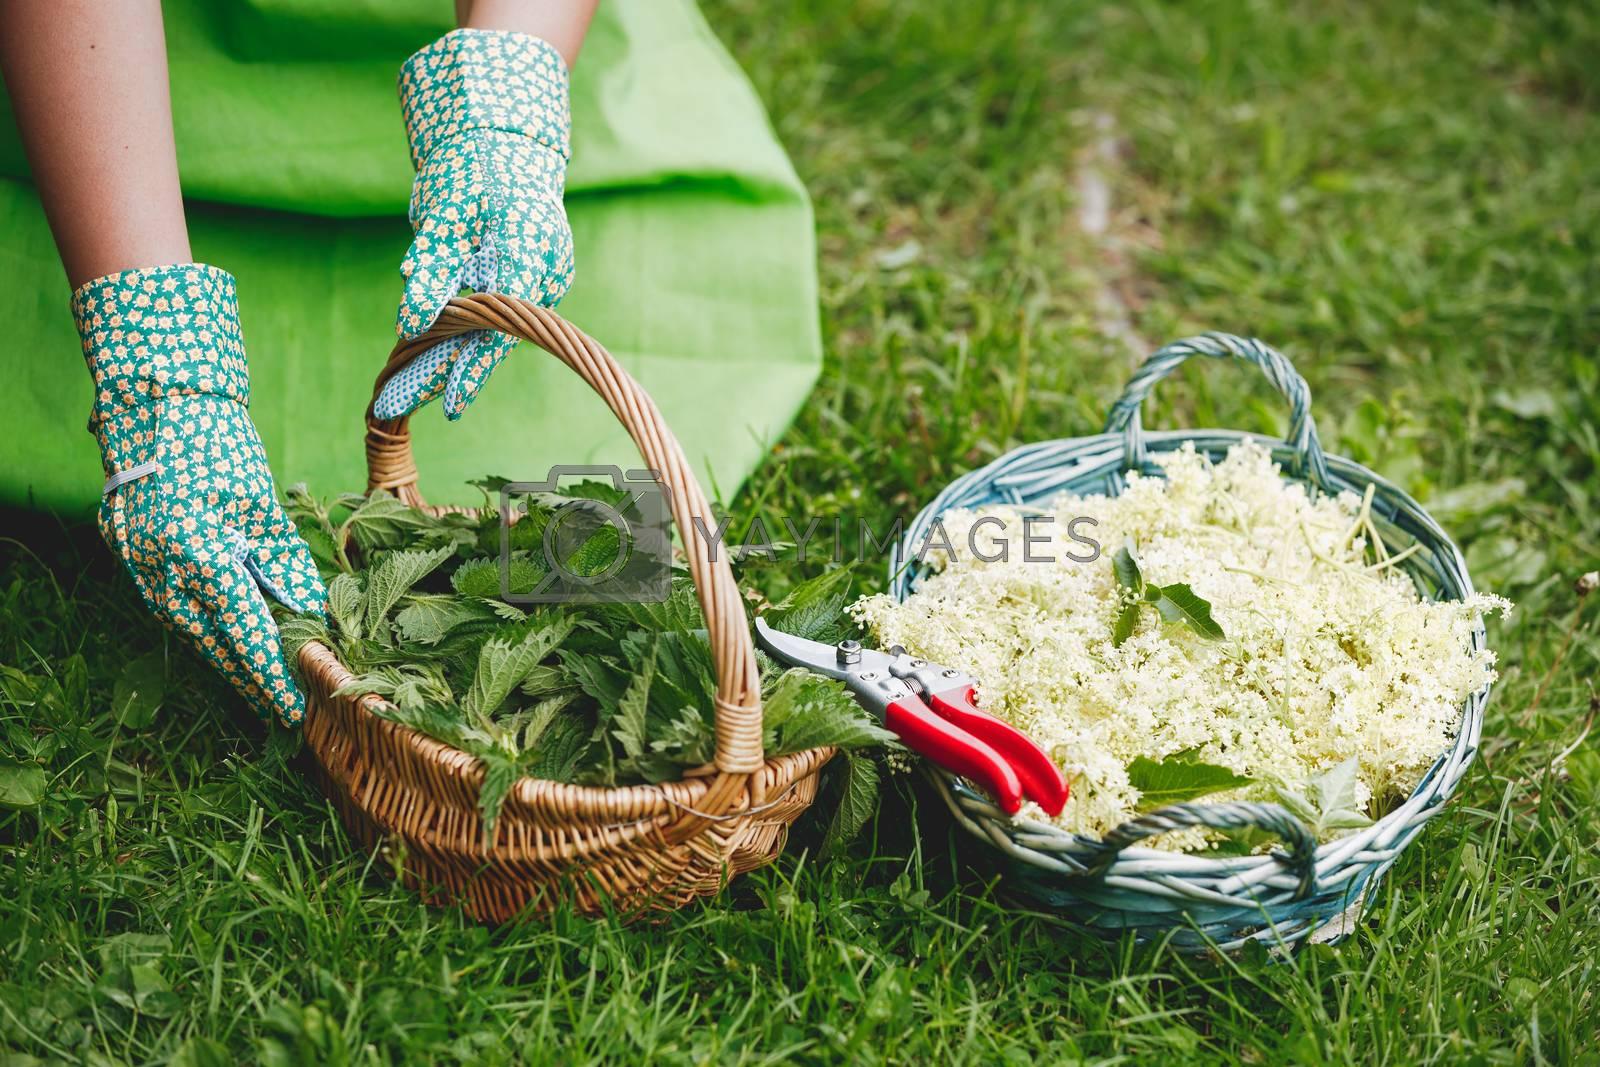 Woman picking nettles and elderflower in a basket, selective focus